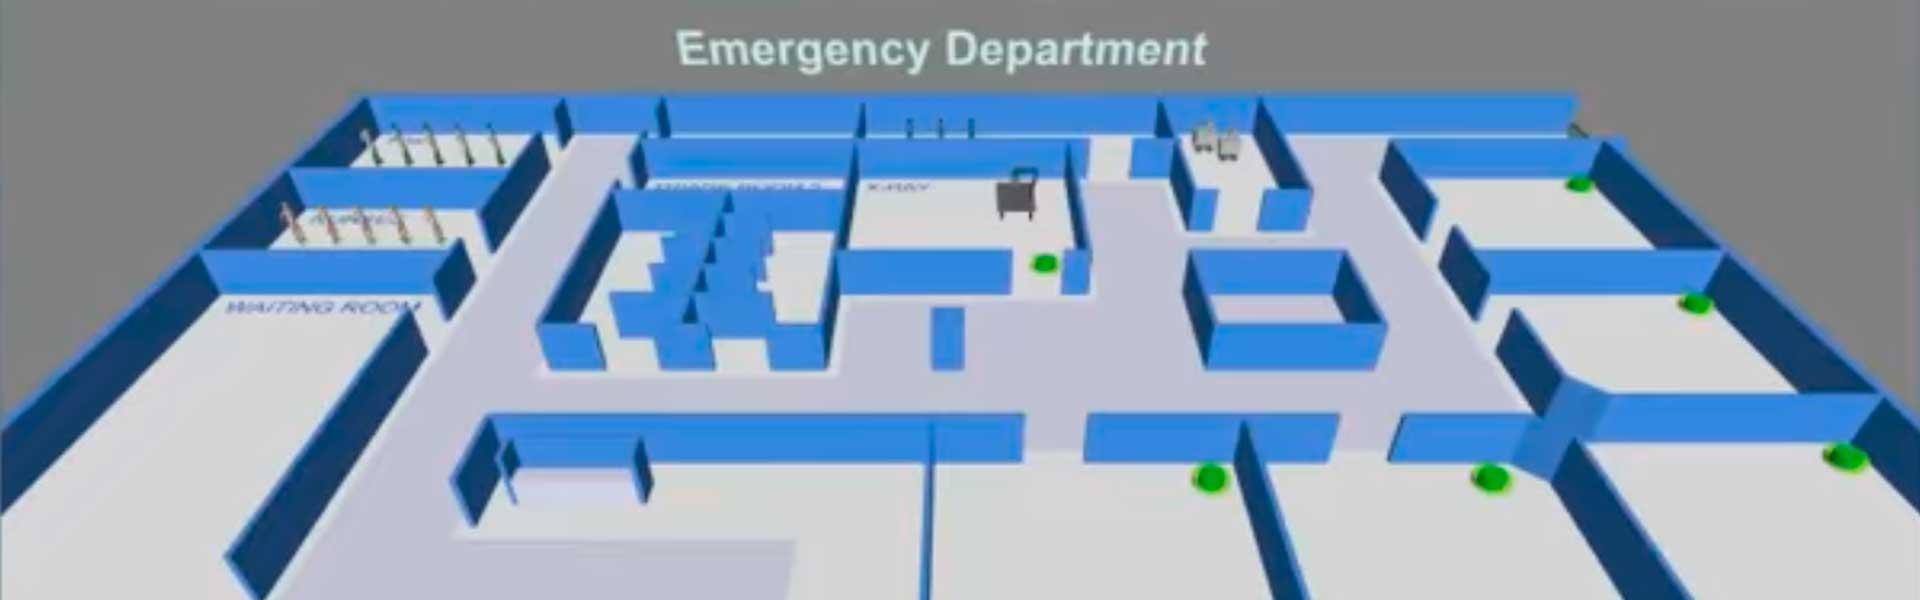 Healthcare Simulation Software – AnyLogic Simulation Software